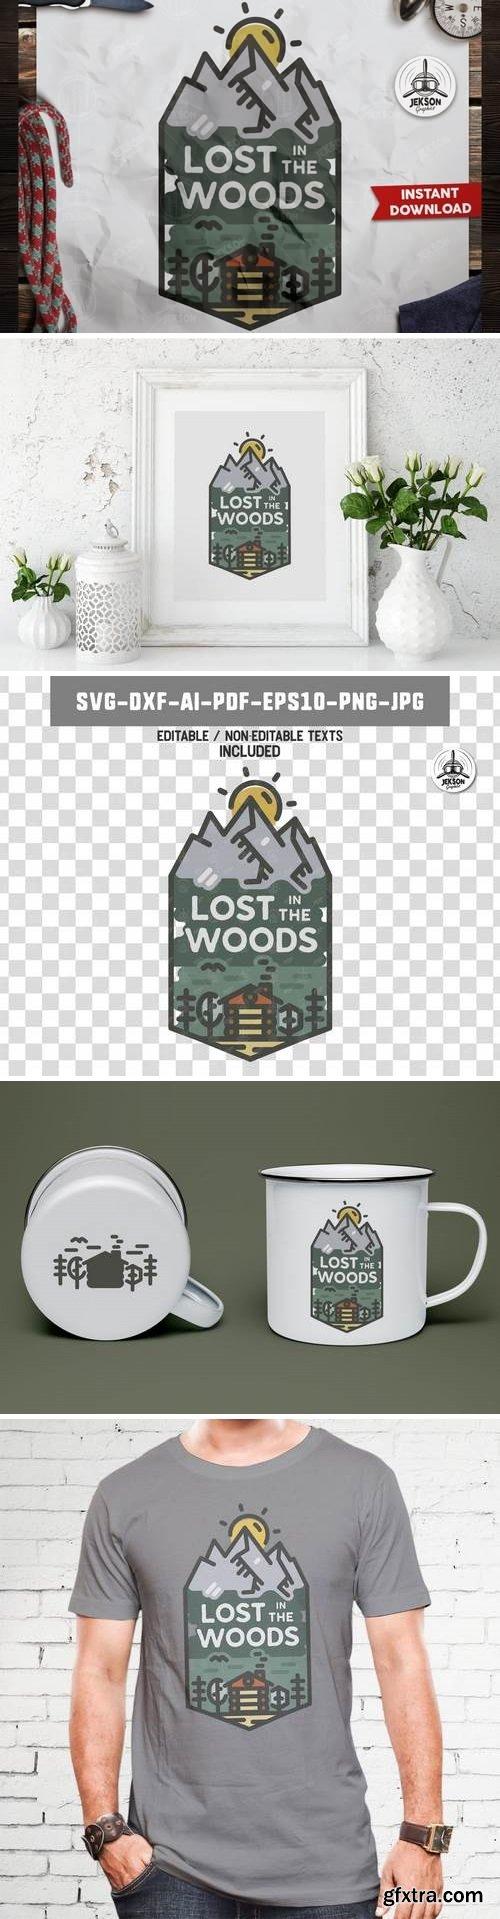 Lost in Wood Badge / Vintage Travel Logo Patch SVG